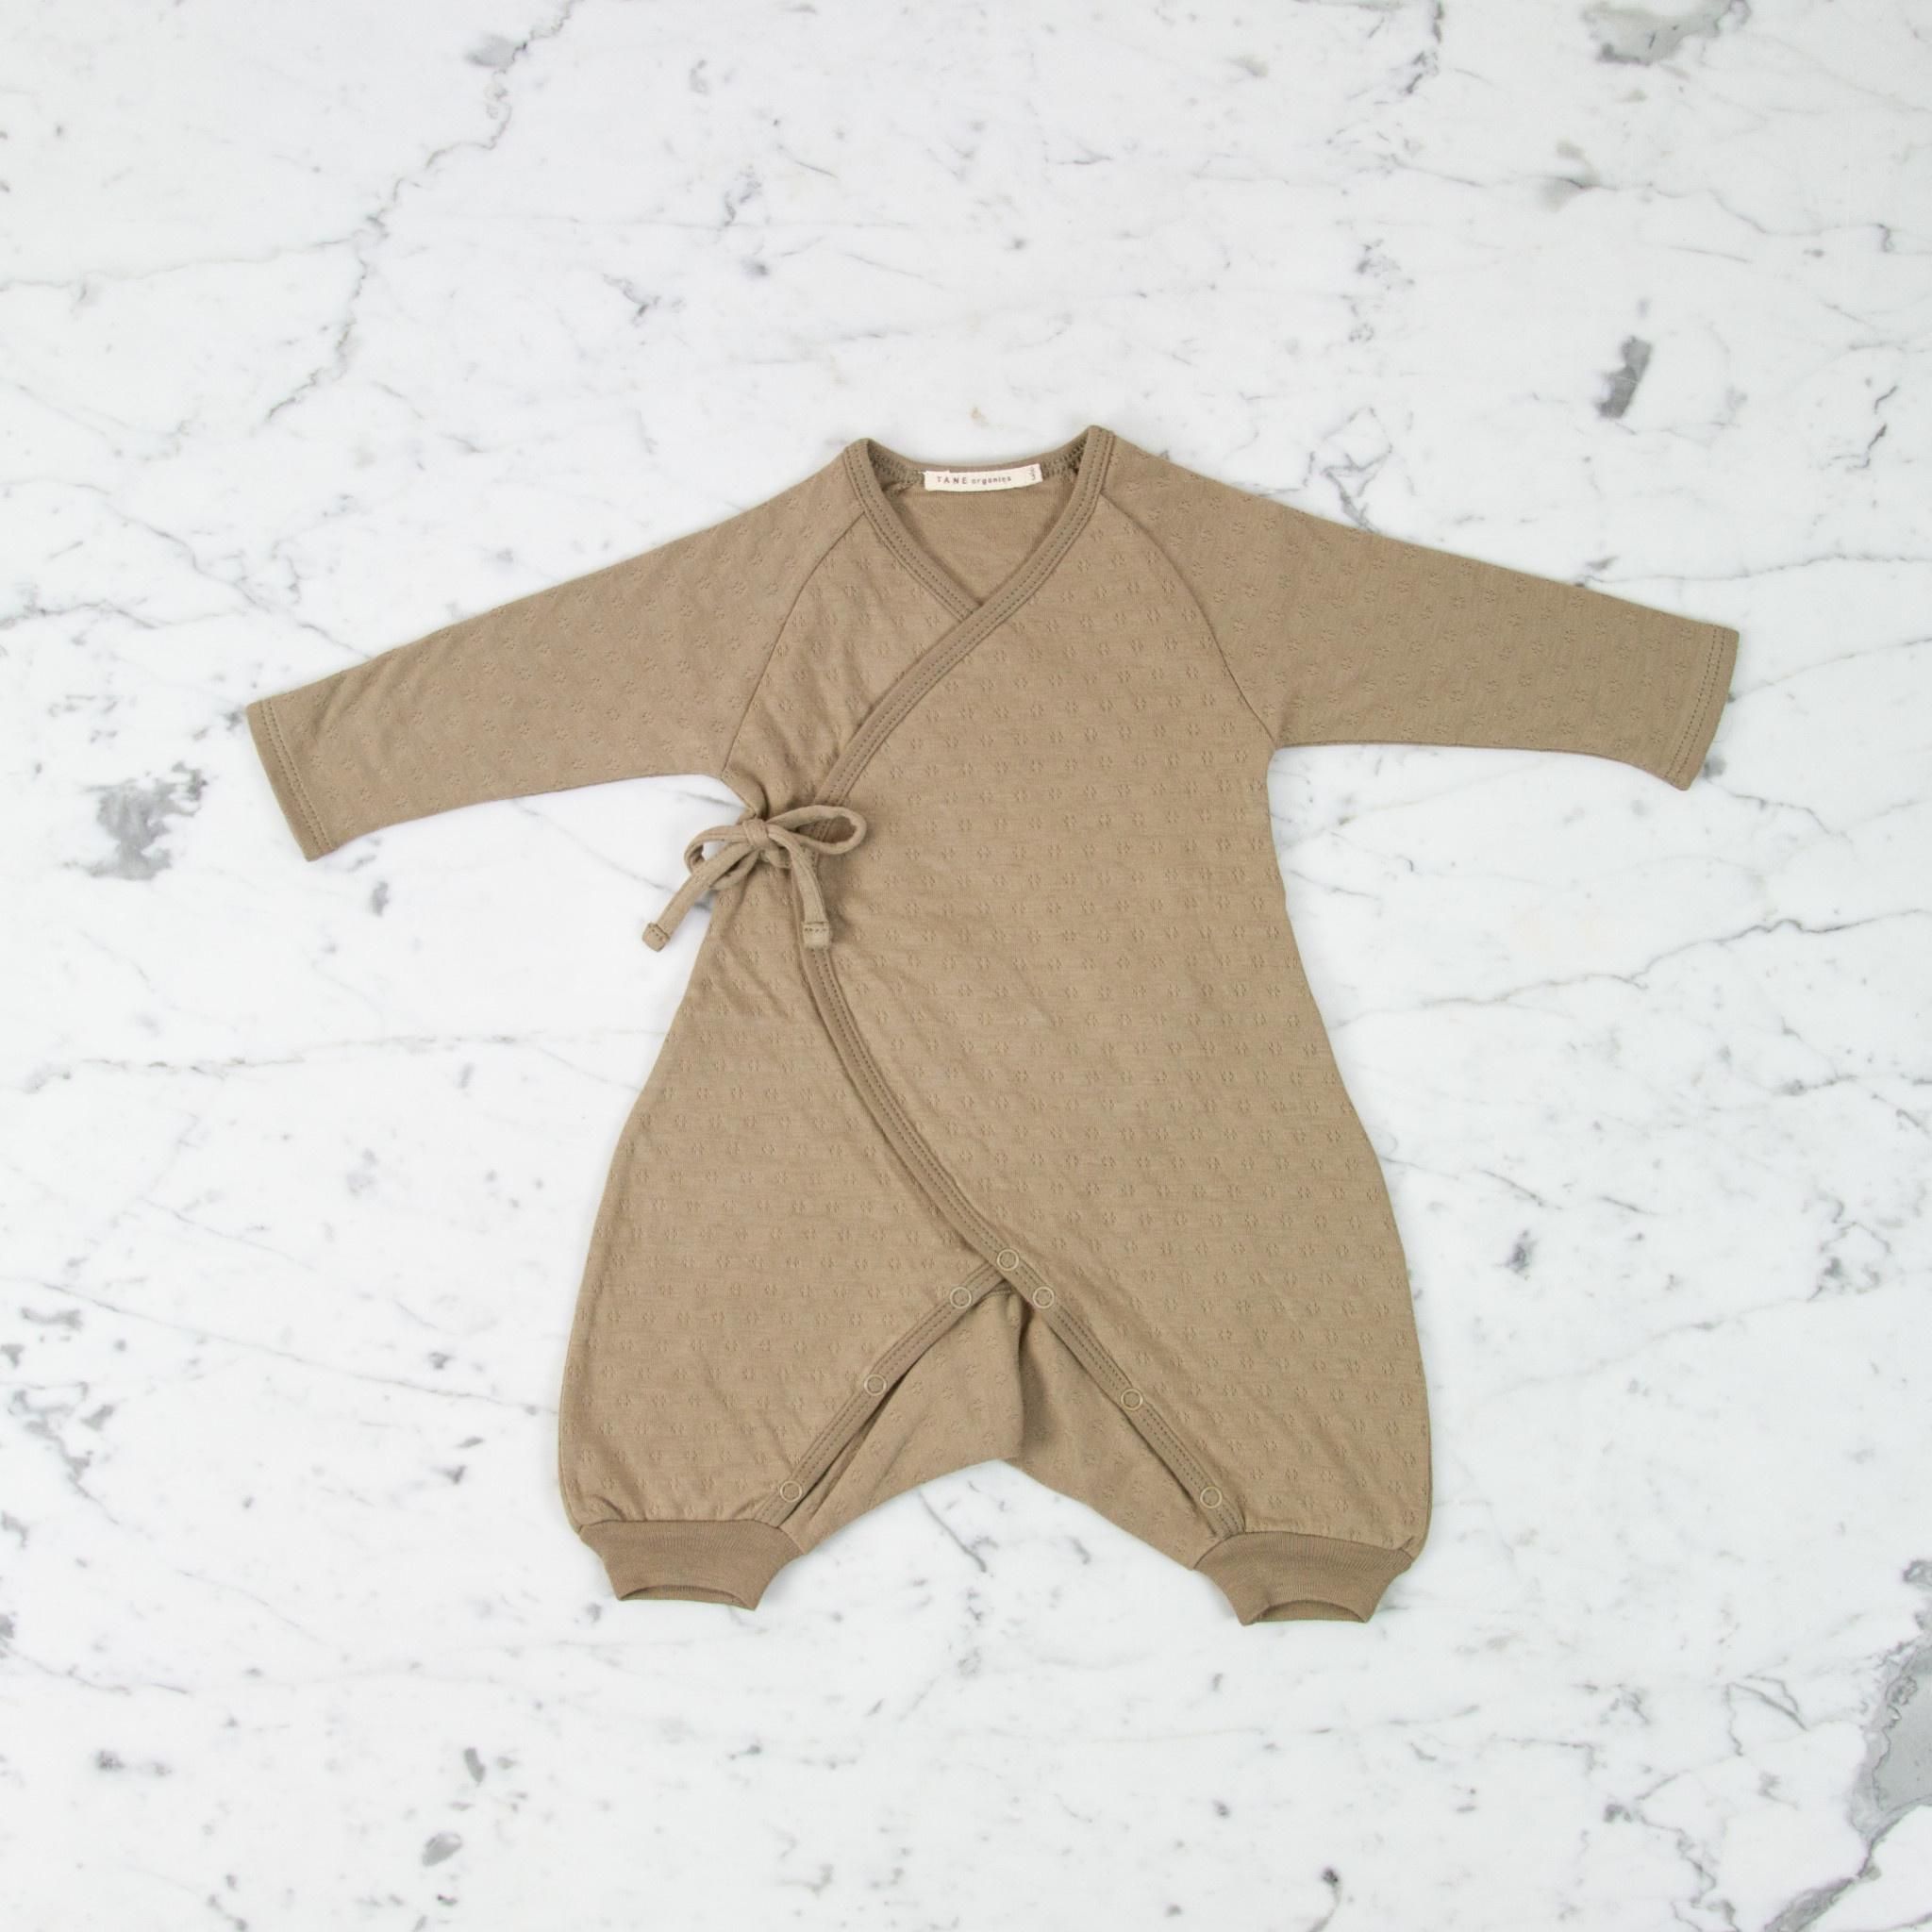 Tane Organics Kimono Onesie with Leggings - Root - 0-3 Month